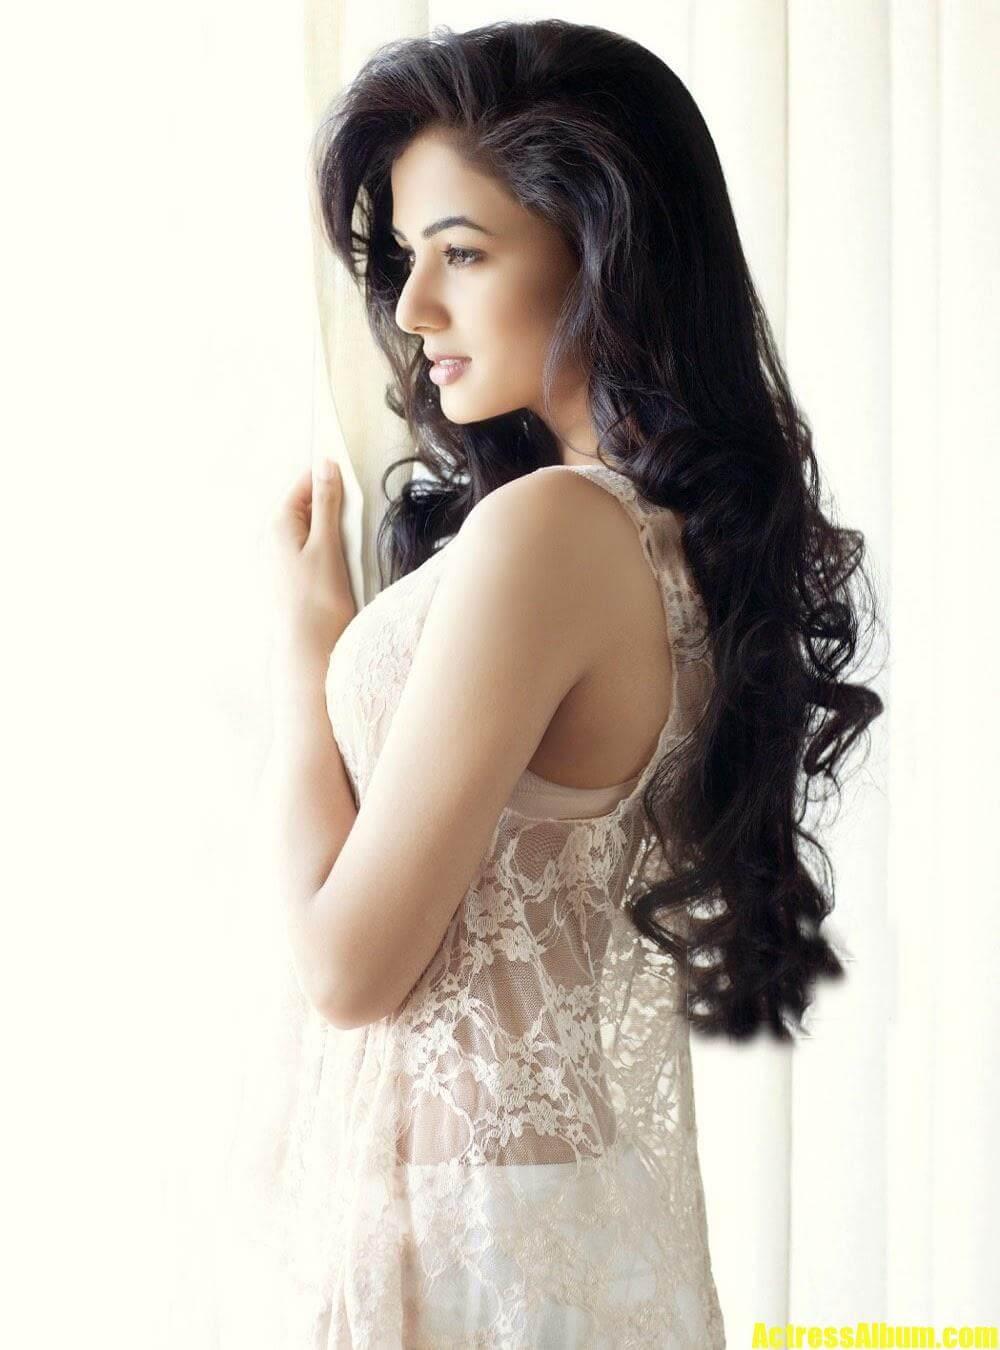 Akshara Haasan Cute Wallpapers Bollywood Hot Sonal Chauhan Latest Sexy Photoshoot Stills